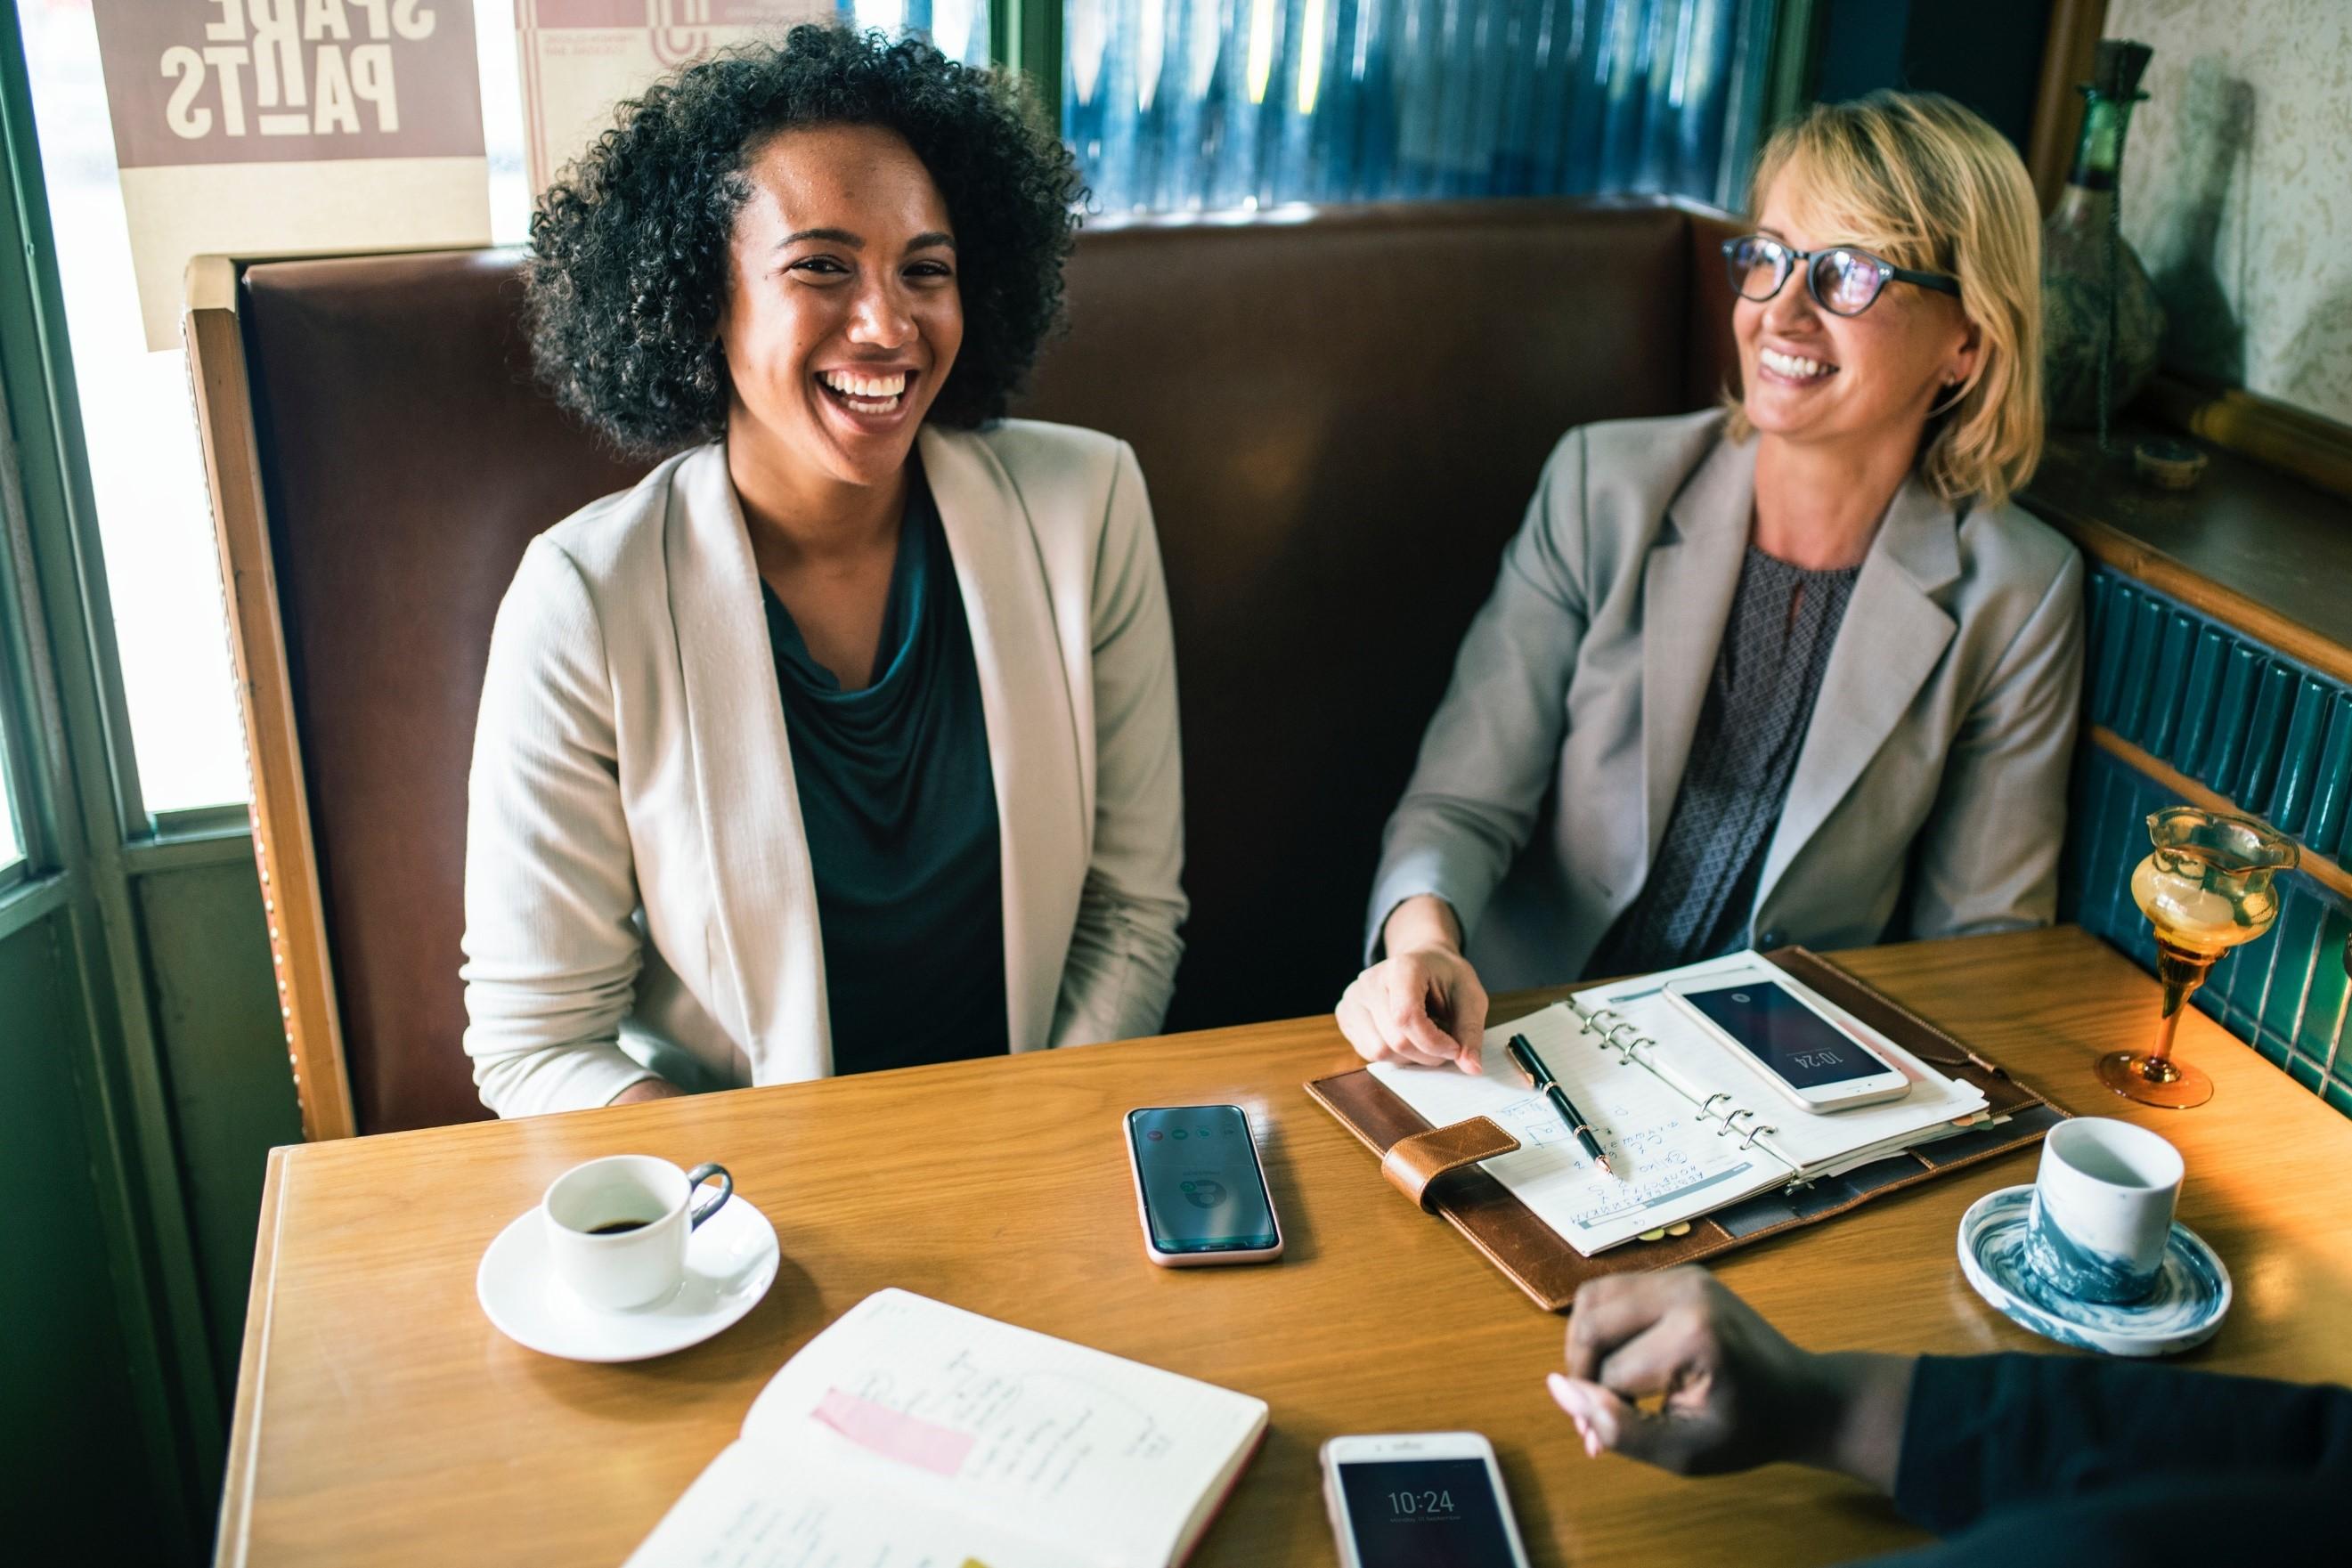 Working Women Are Happier